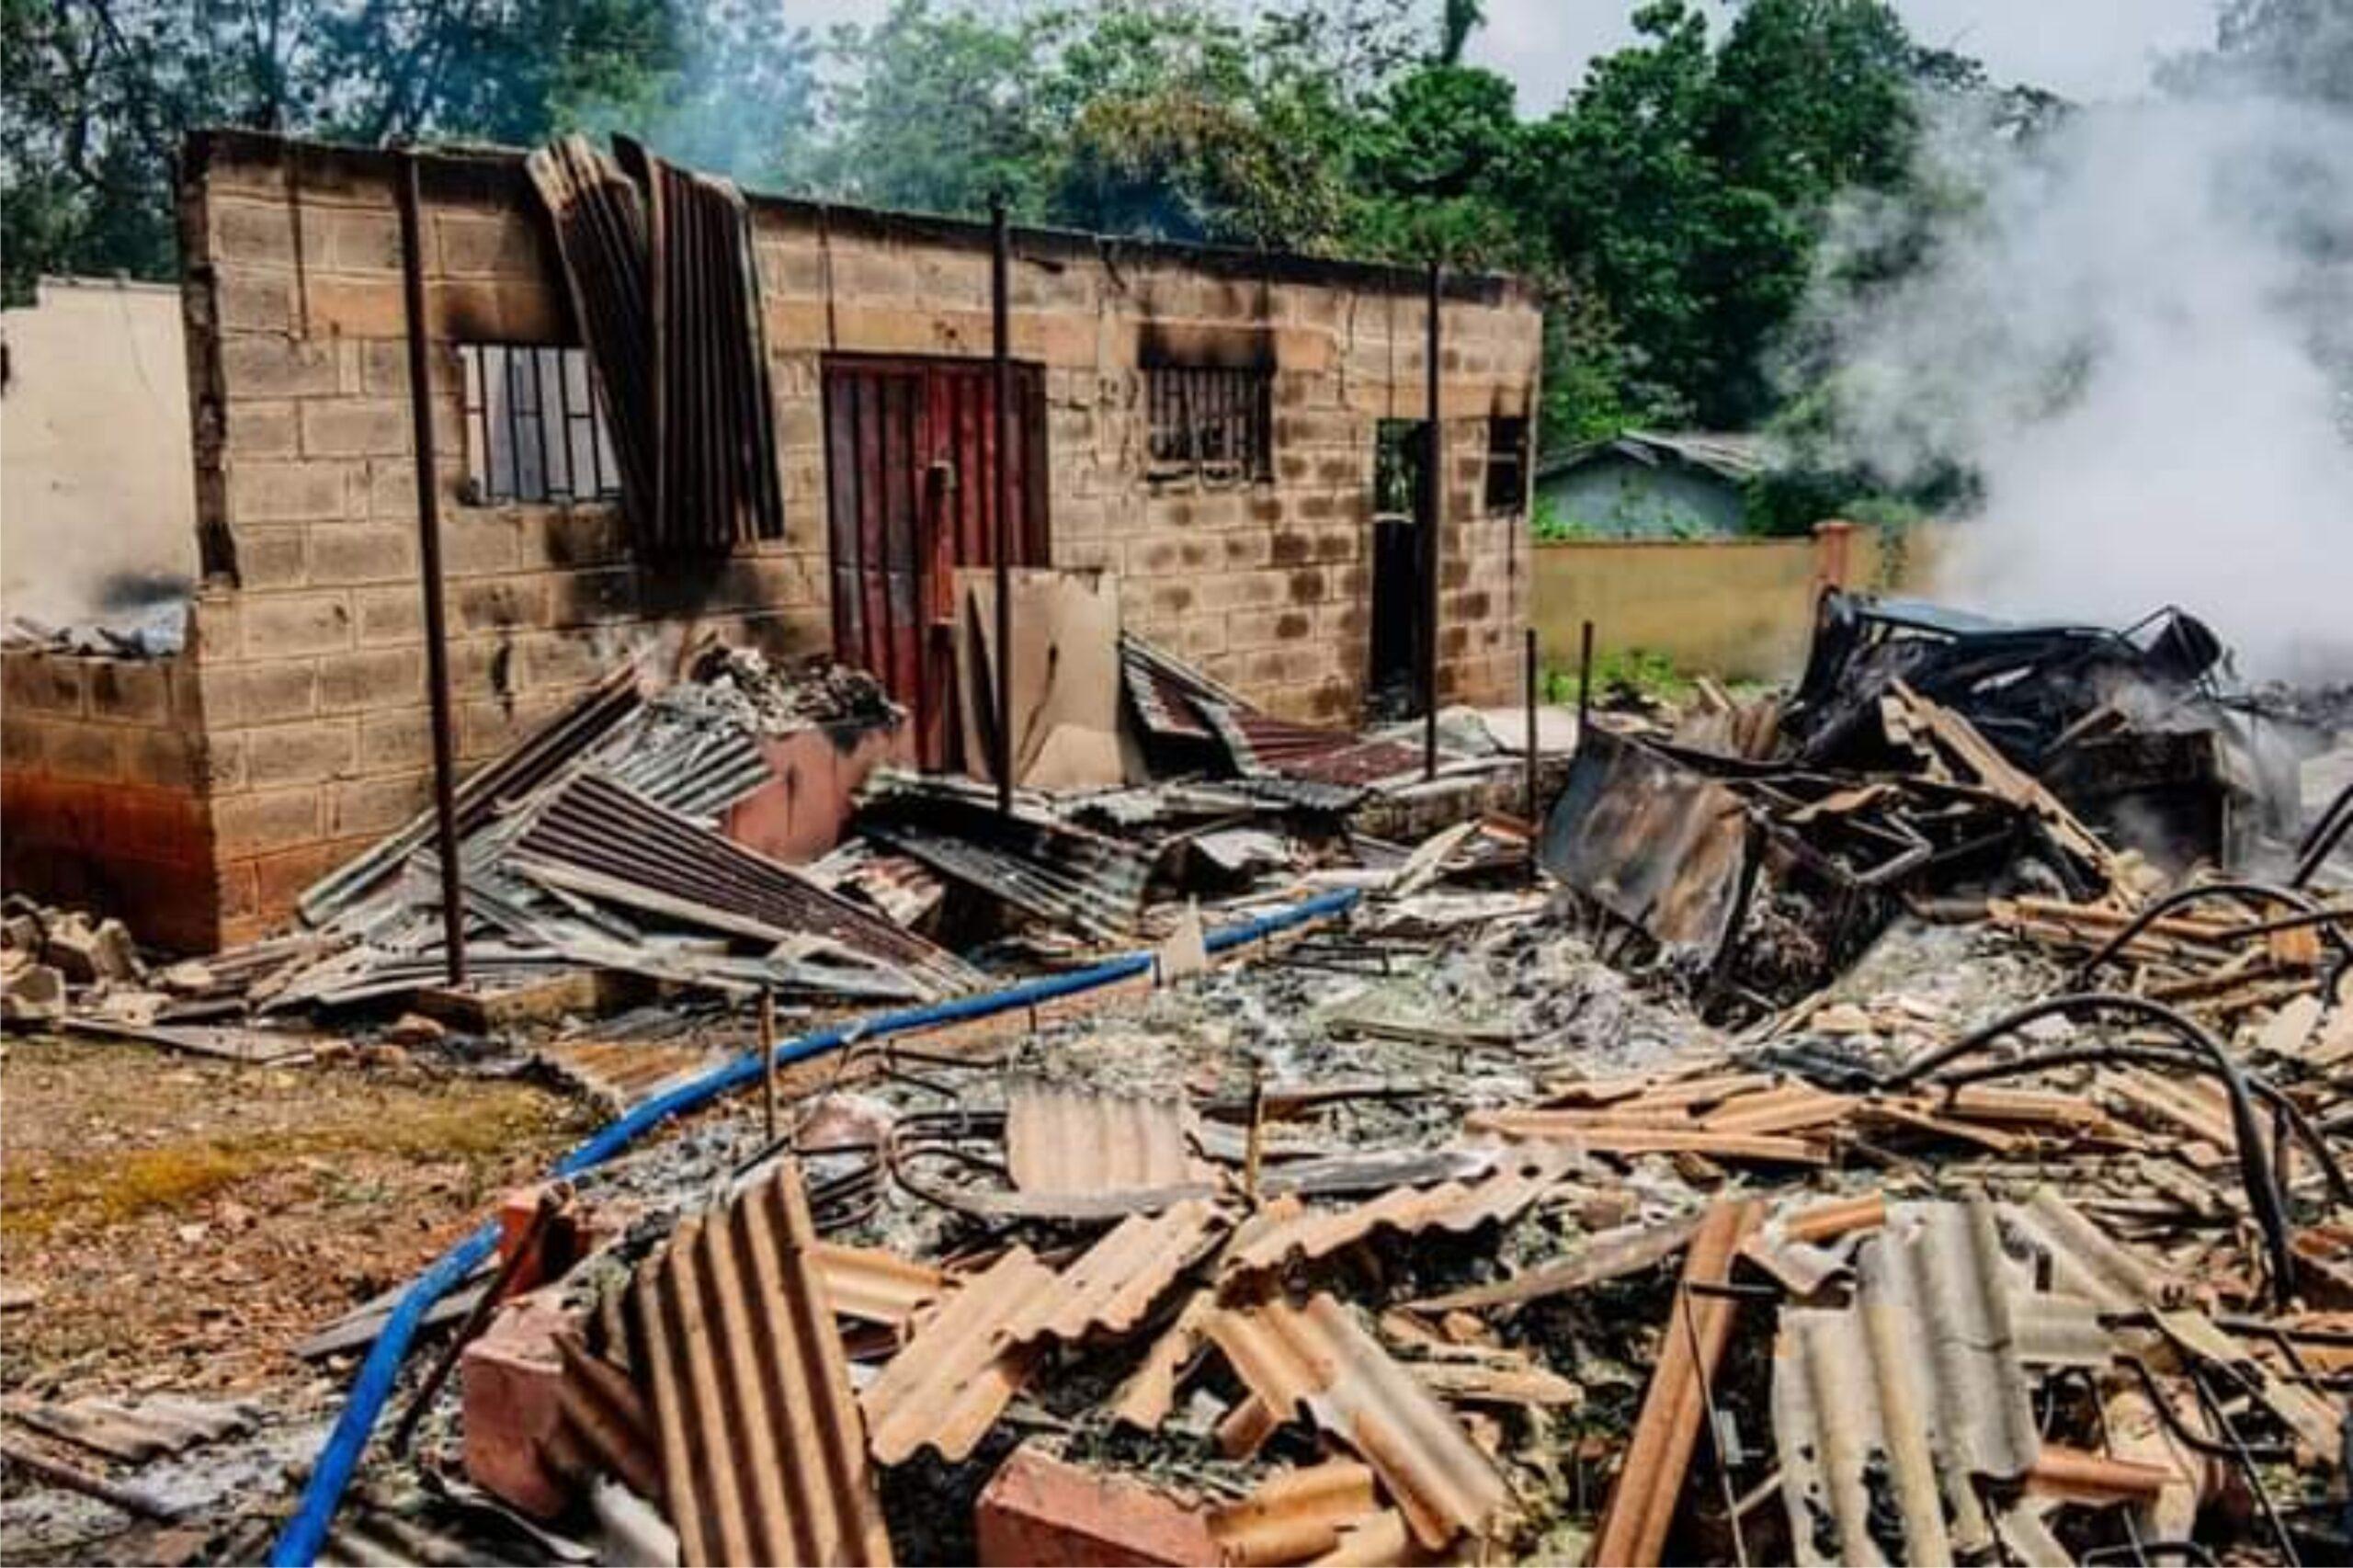 #ENDSARS protests: Okitipupa APC leaders visit violence scenes